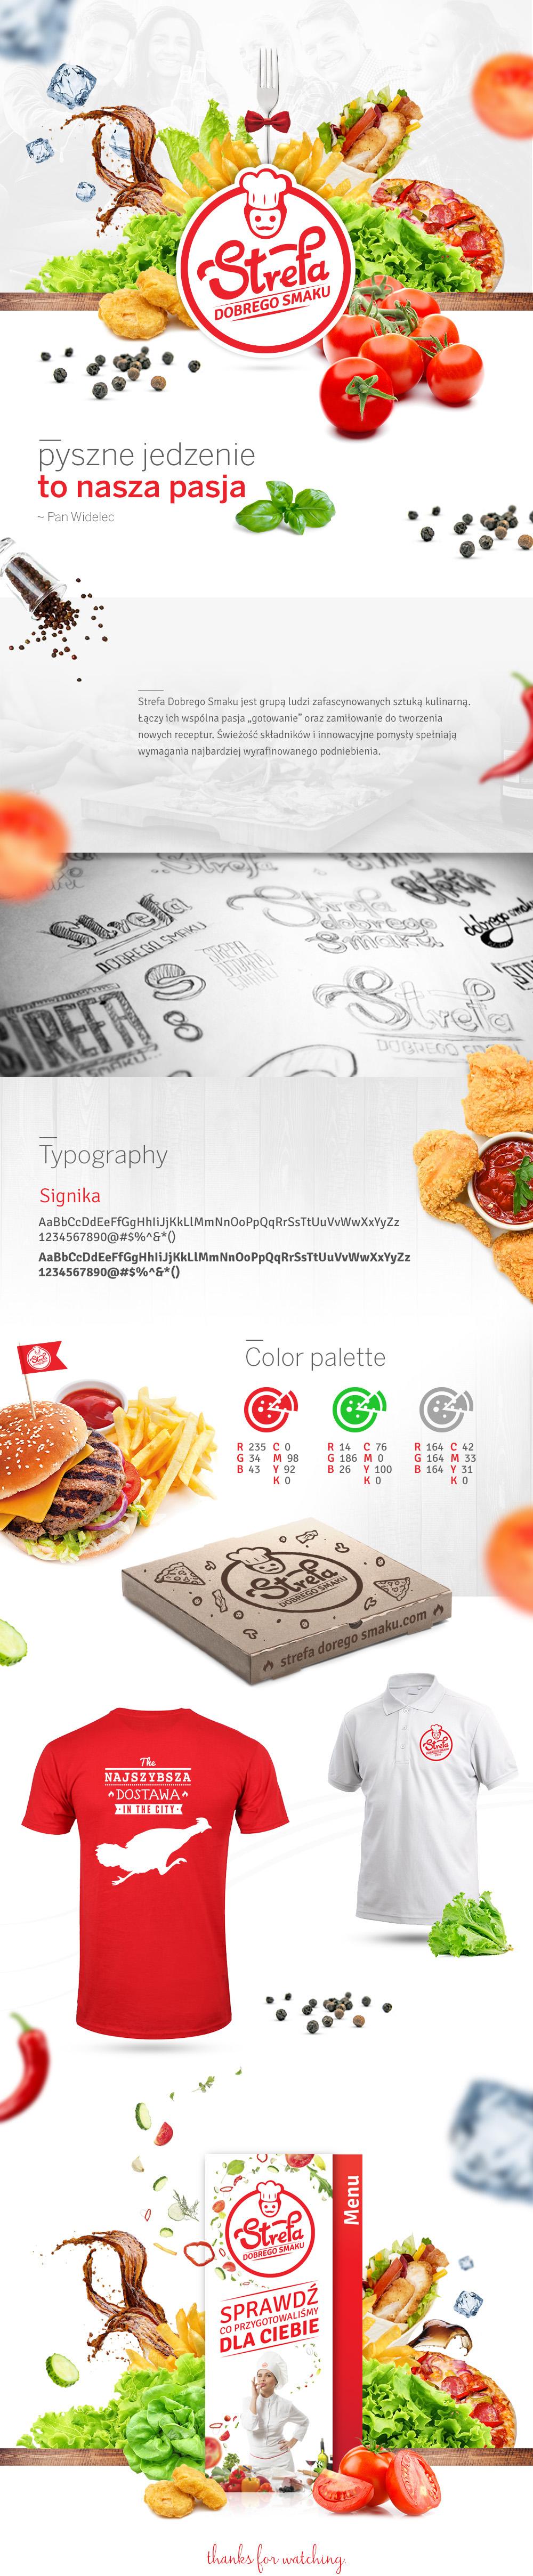 Food  Fast food restaurant taste kitchen Pizza fresh cooking design Art Director